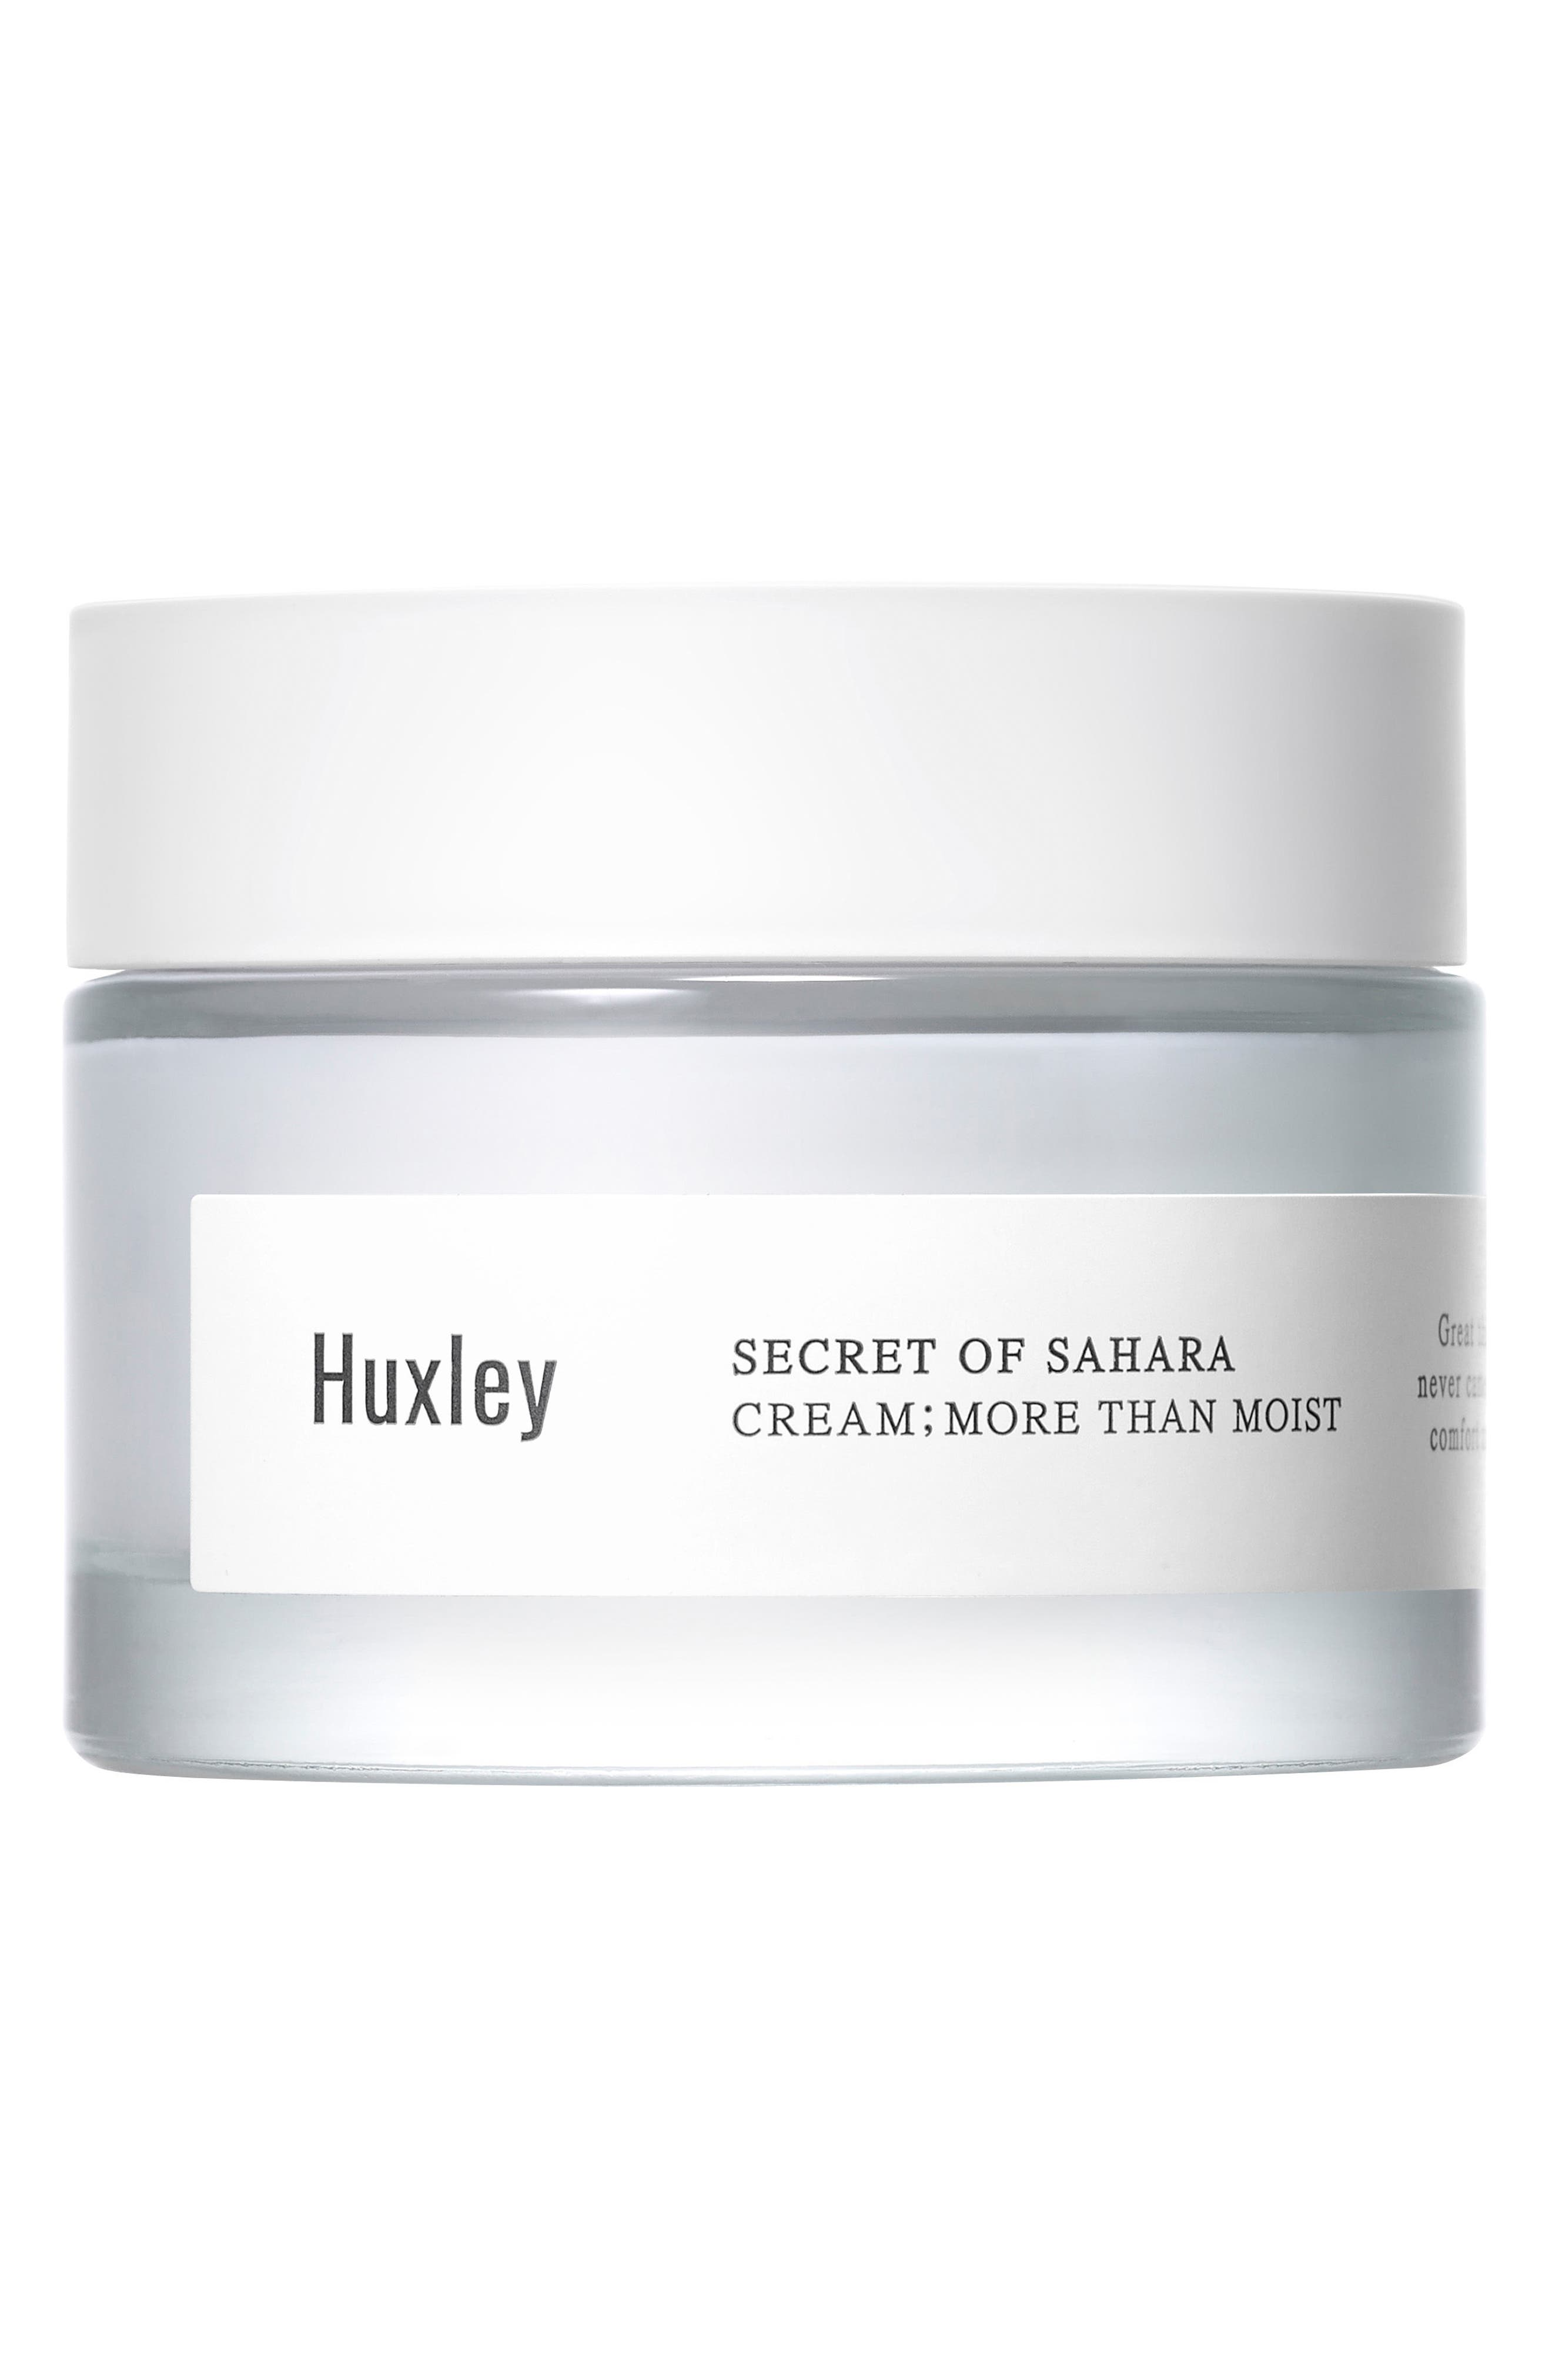 Alternate Image 1 Selected - Huxley Secret of Sahara More Than Moist Nourishing Cream